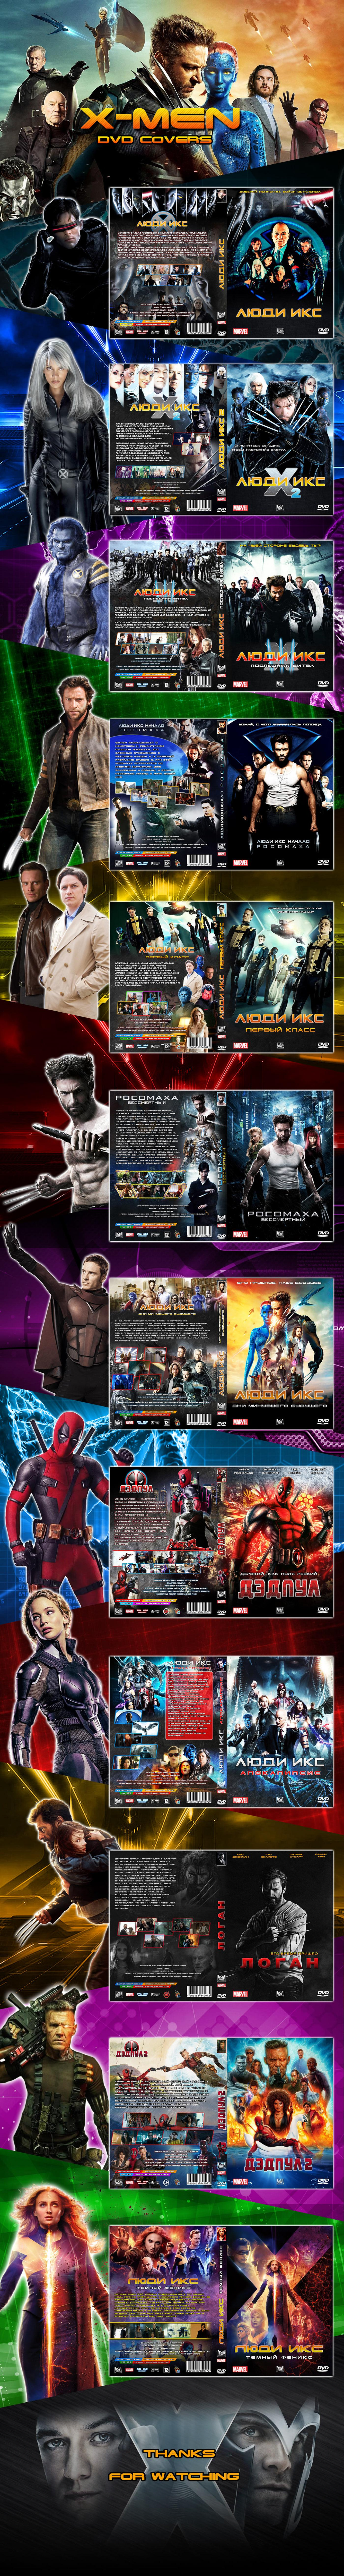 dvd covers Movies marvel 20 Century Fox graphic wolverine x-men Dark Phoenix